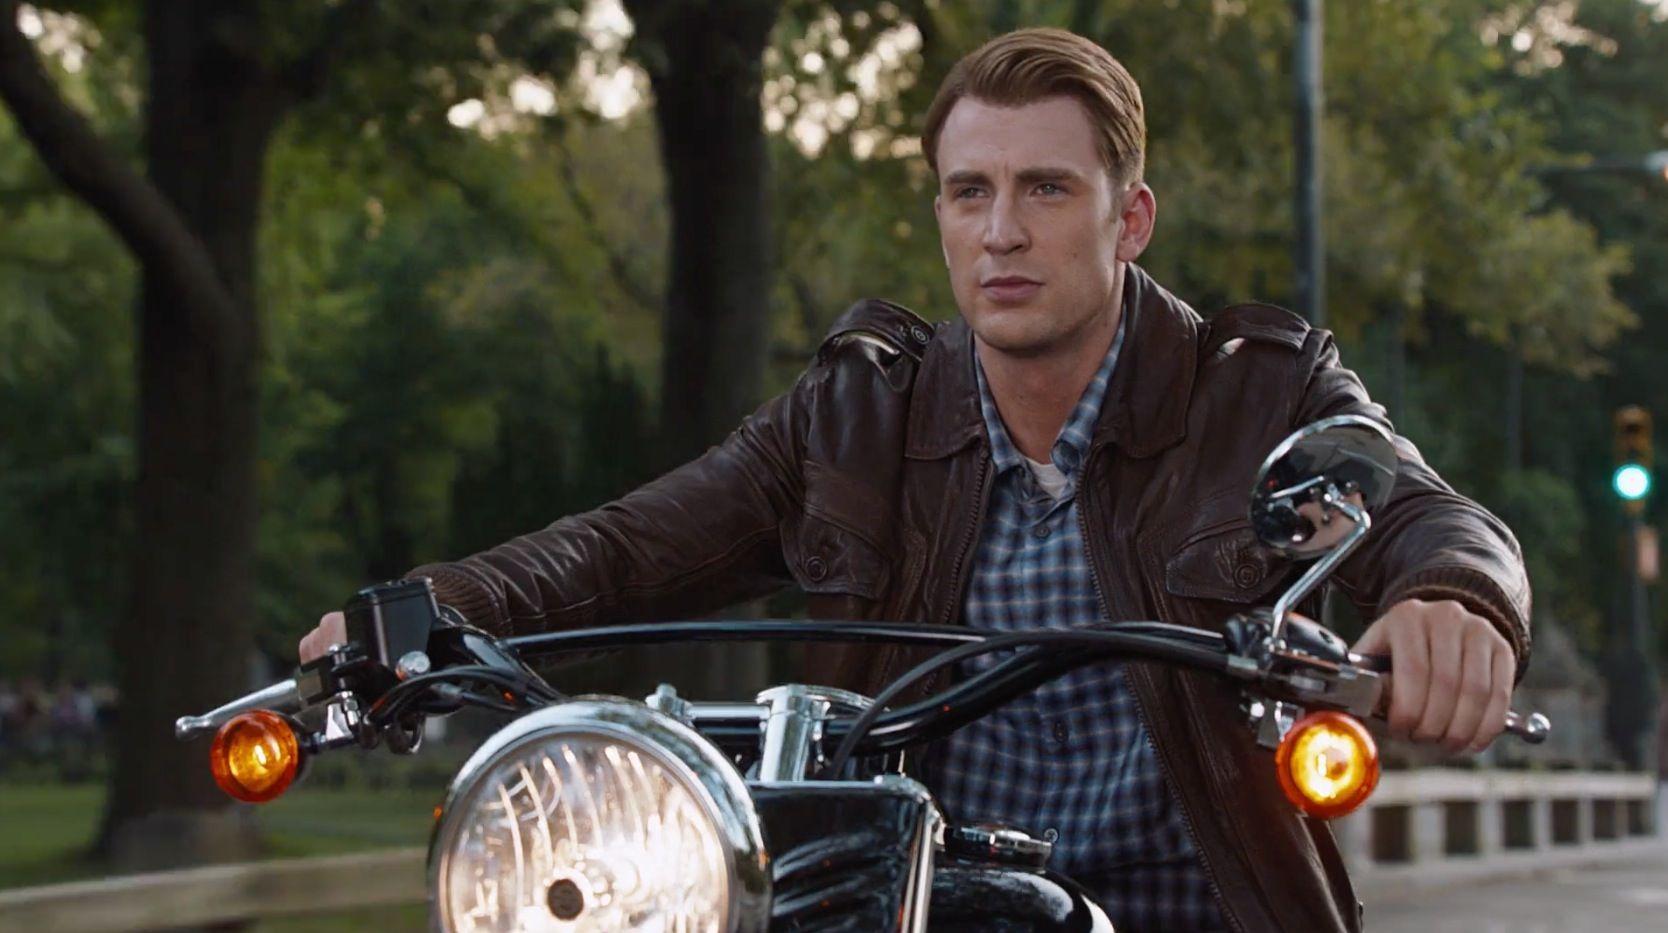 Harley Davidson Movie: Harley-Davidson Softail Slim Motorcycle Driven By Chris